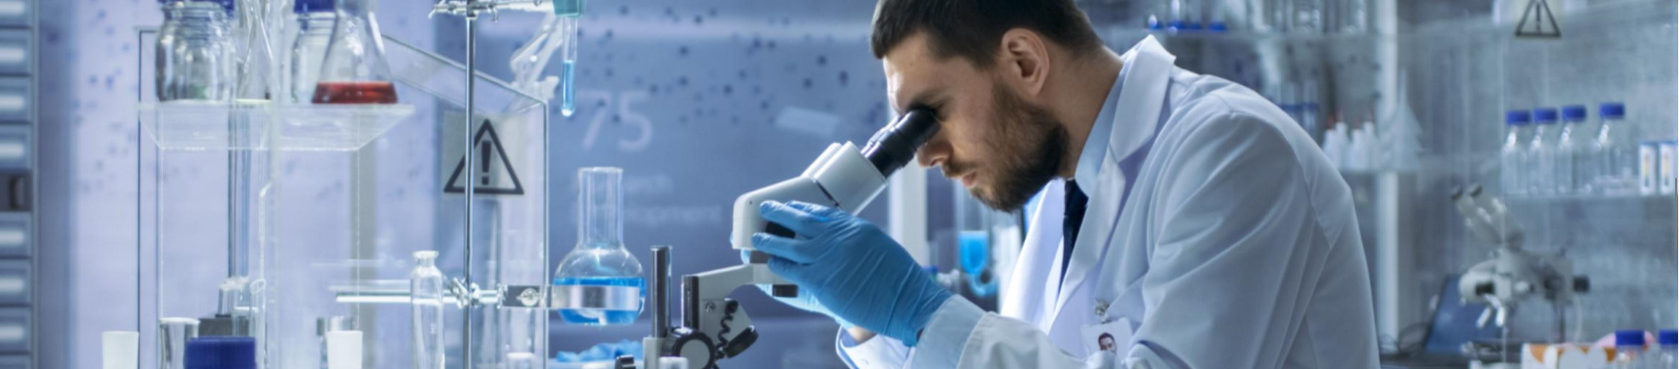 Armet scientist